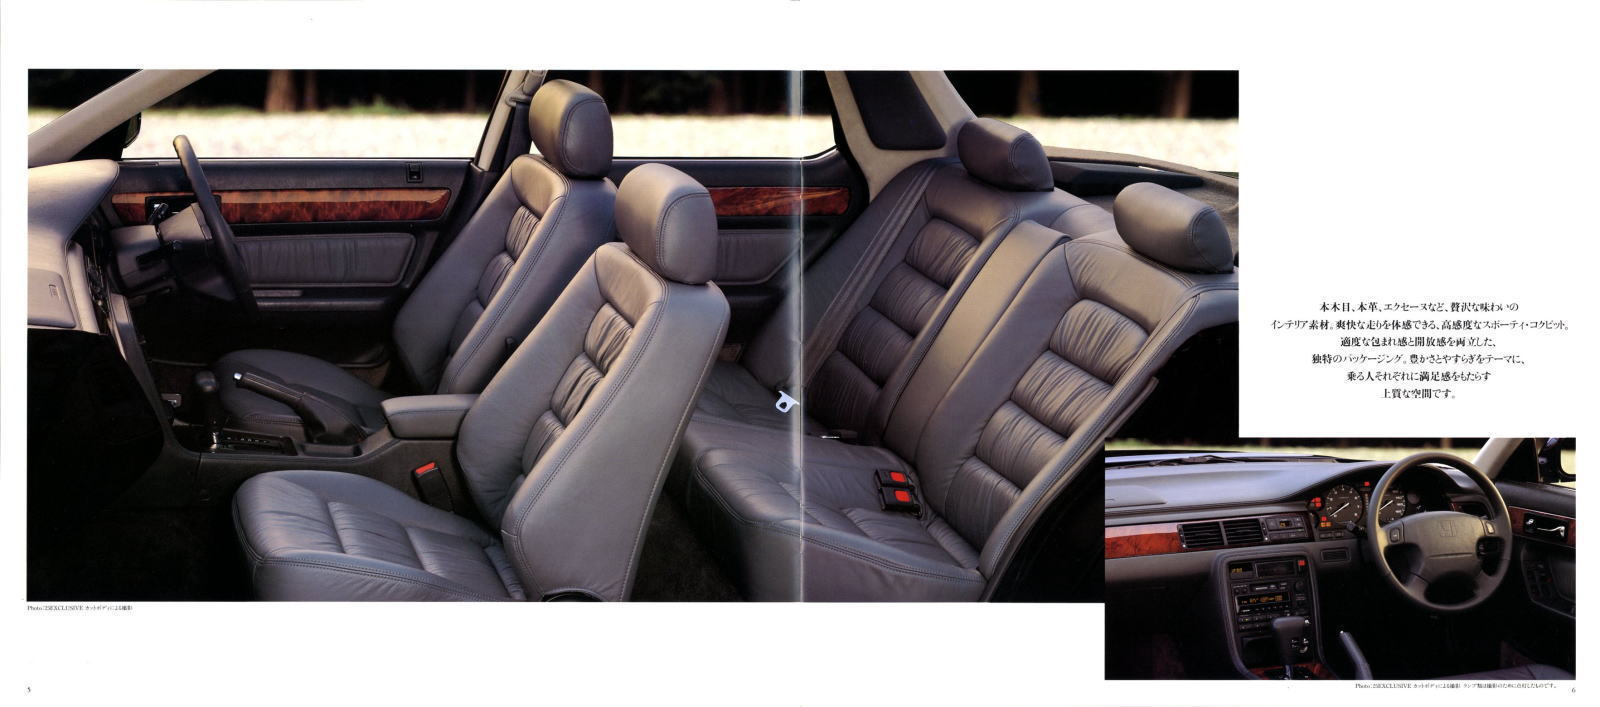 Honda, silnik, pięć cylindrów, R5, straight 5, G20A, G25A, 5-cylinder, engine, JDM, Inspire, Midship, ホンダ, 日本車